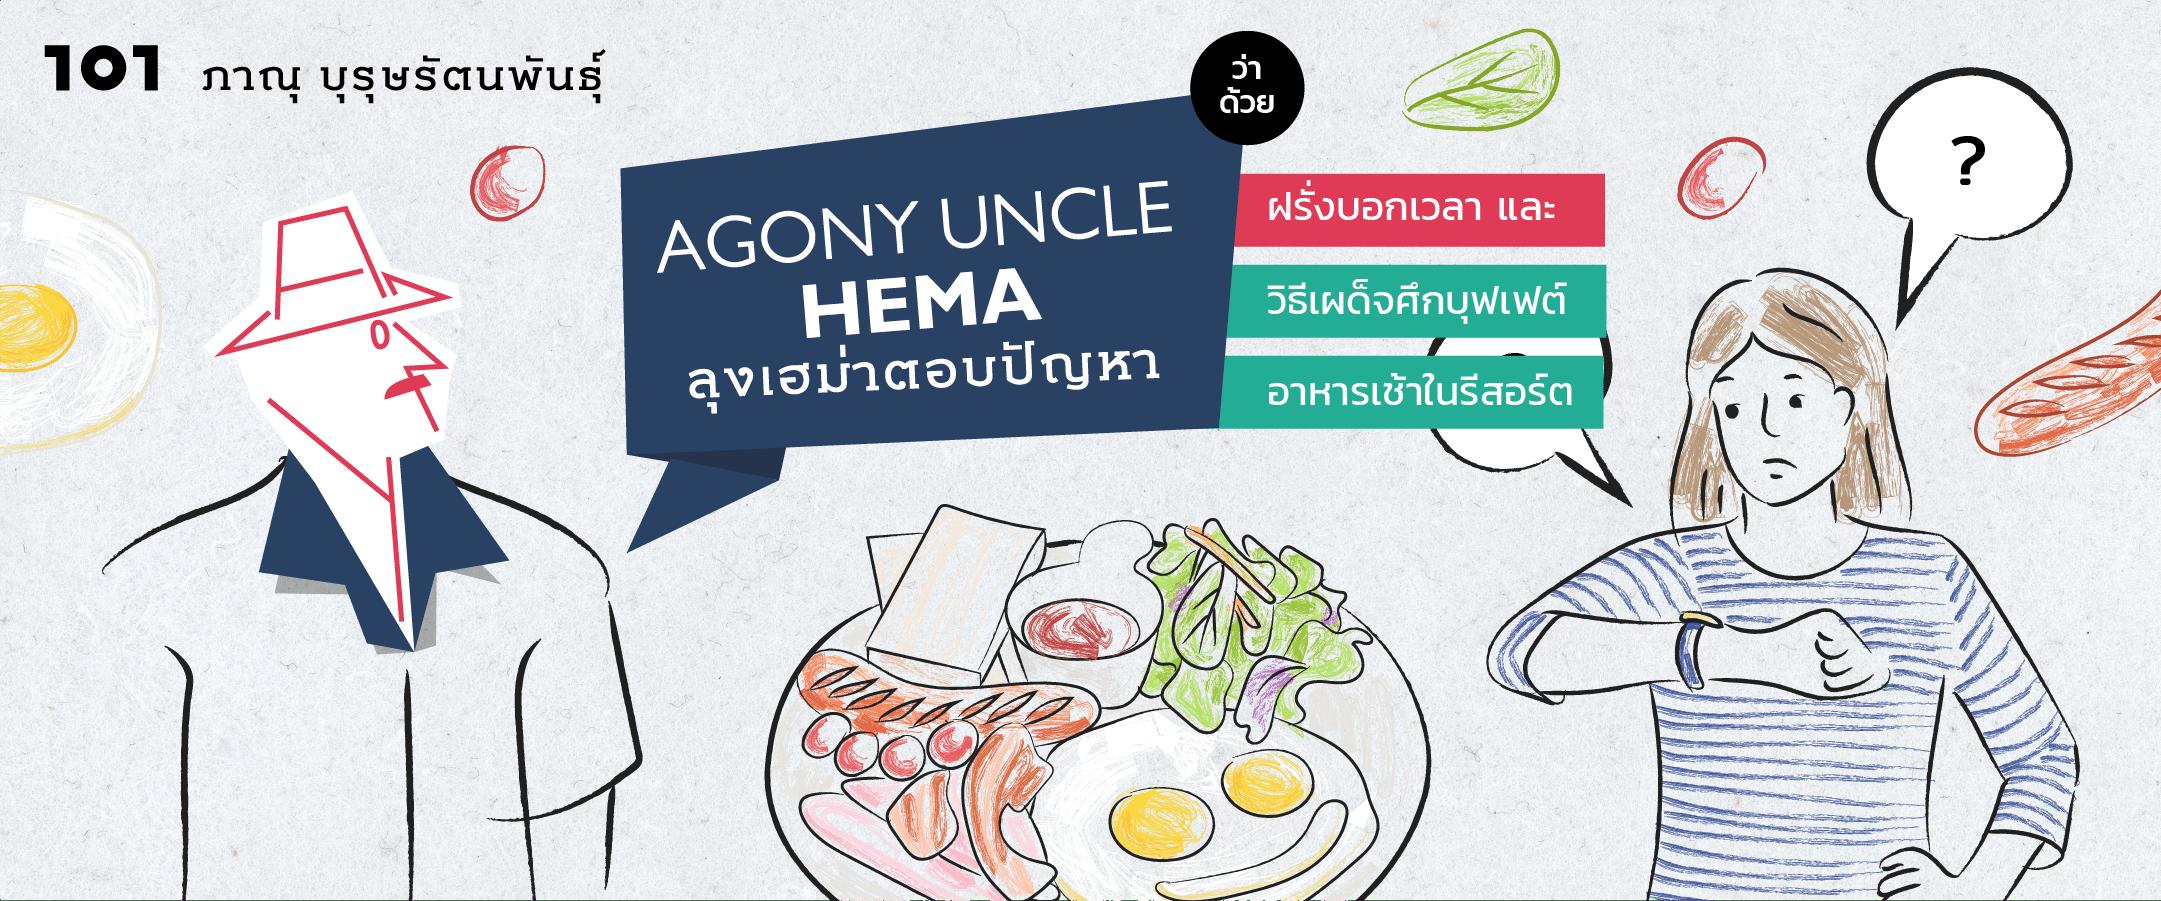 Agony Uncle* Hema ลุงเฮม่าตอบปัญหา